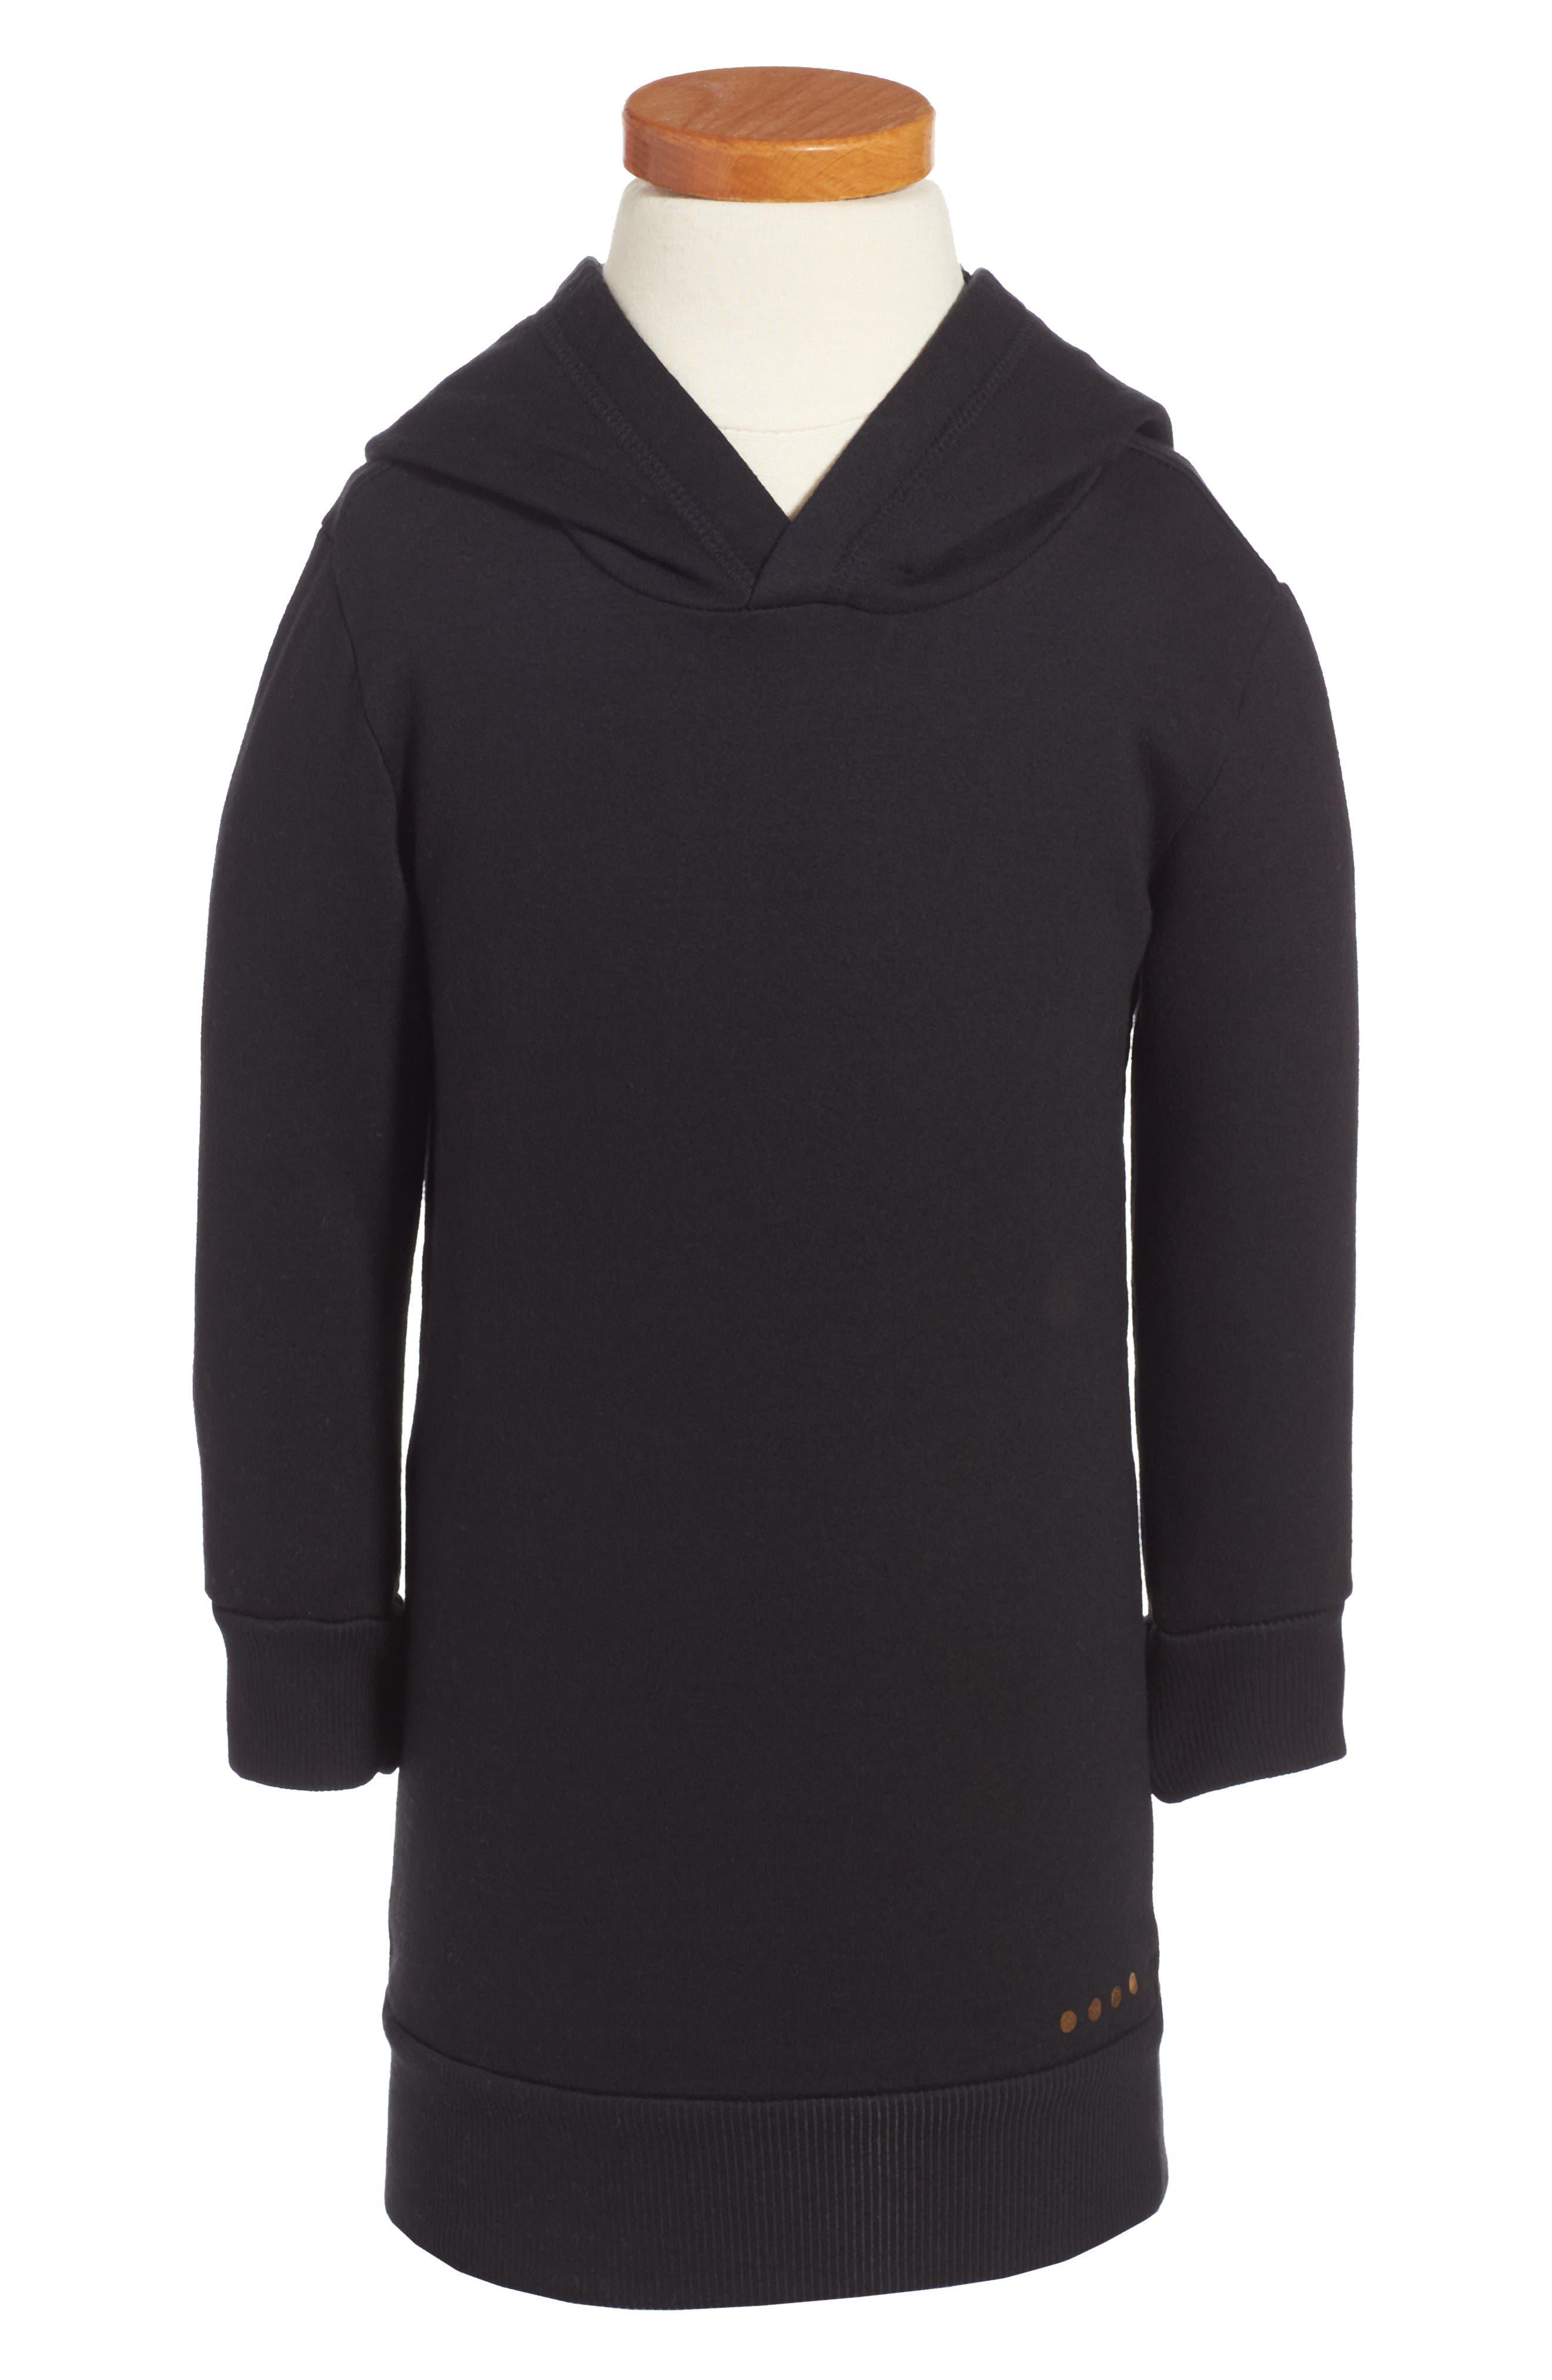 BERU Luna Hooded Organic Cotton Sweatshirt Dress